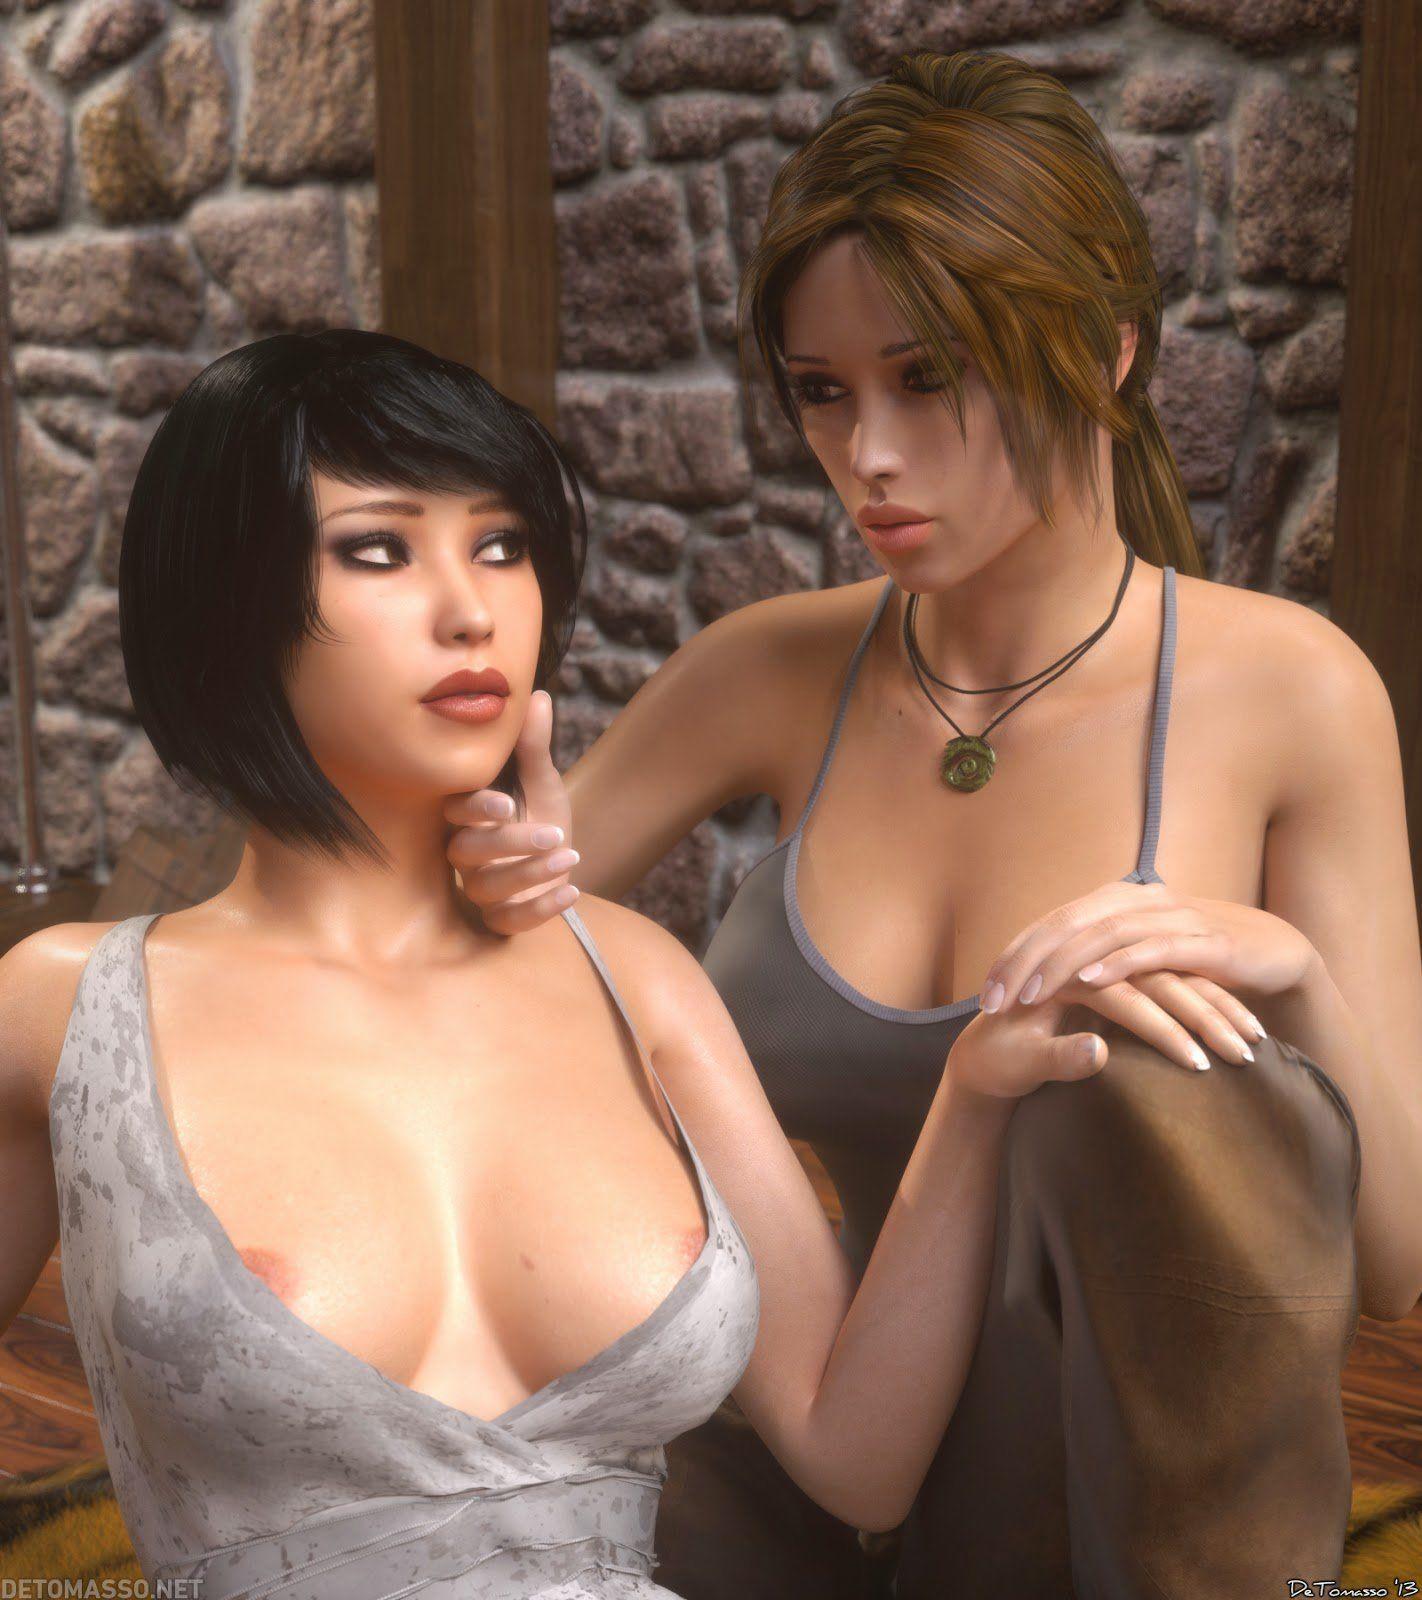 hentaihome.net-Tomb-Raider-porno-3D-3